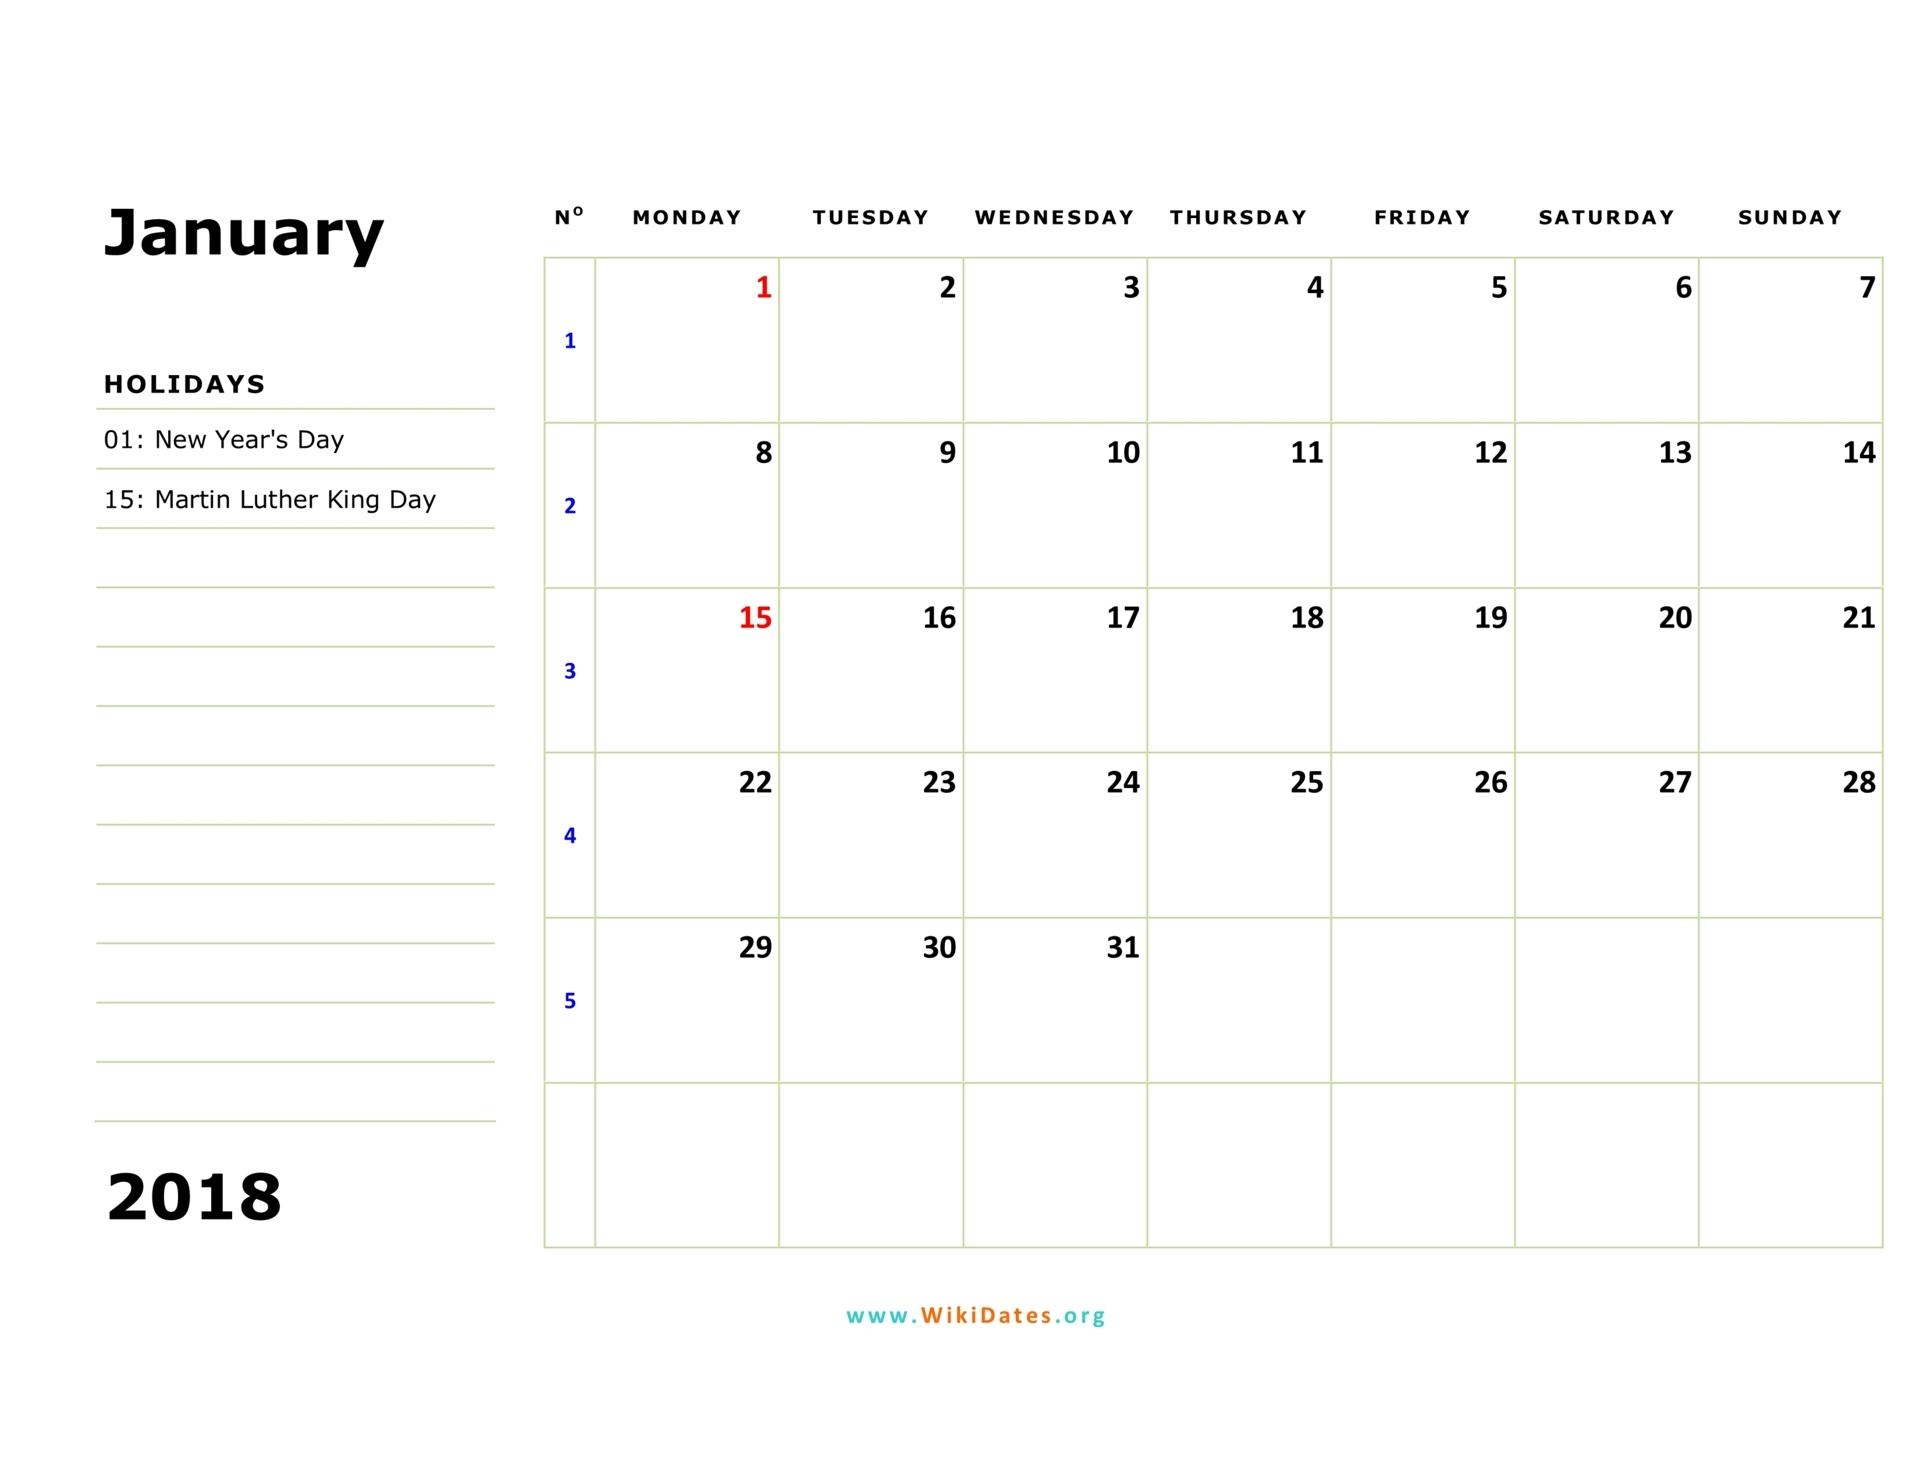 2018 Calendar | Wikidates